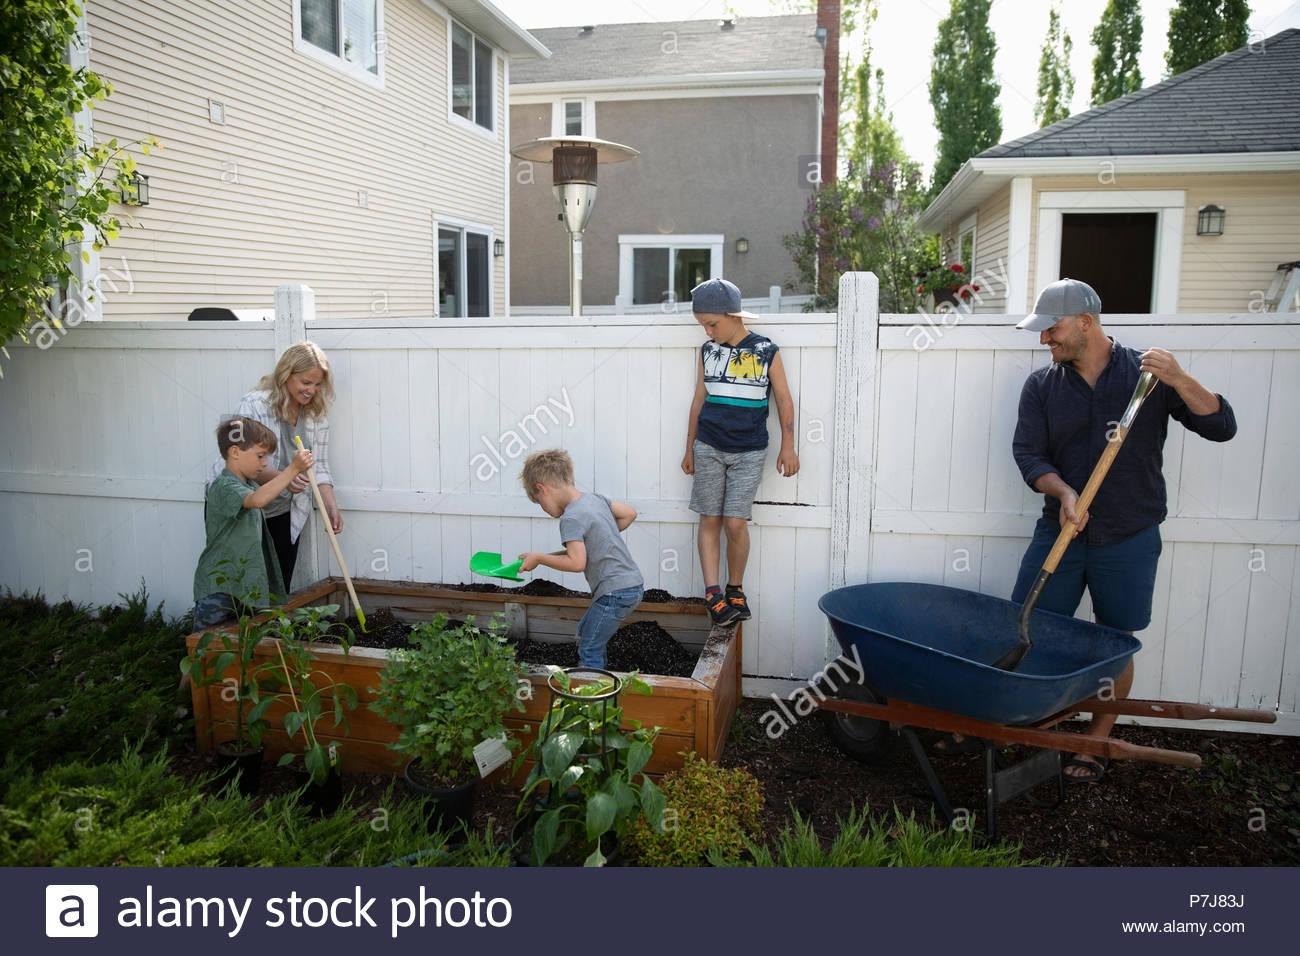 Famiglia giardinaggio in back yard Immagini Stock